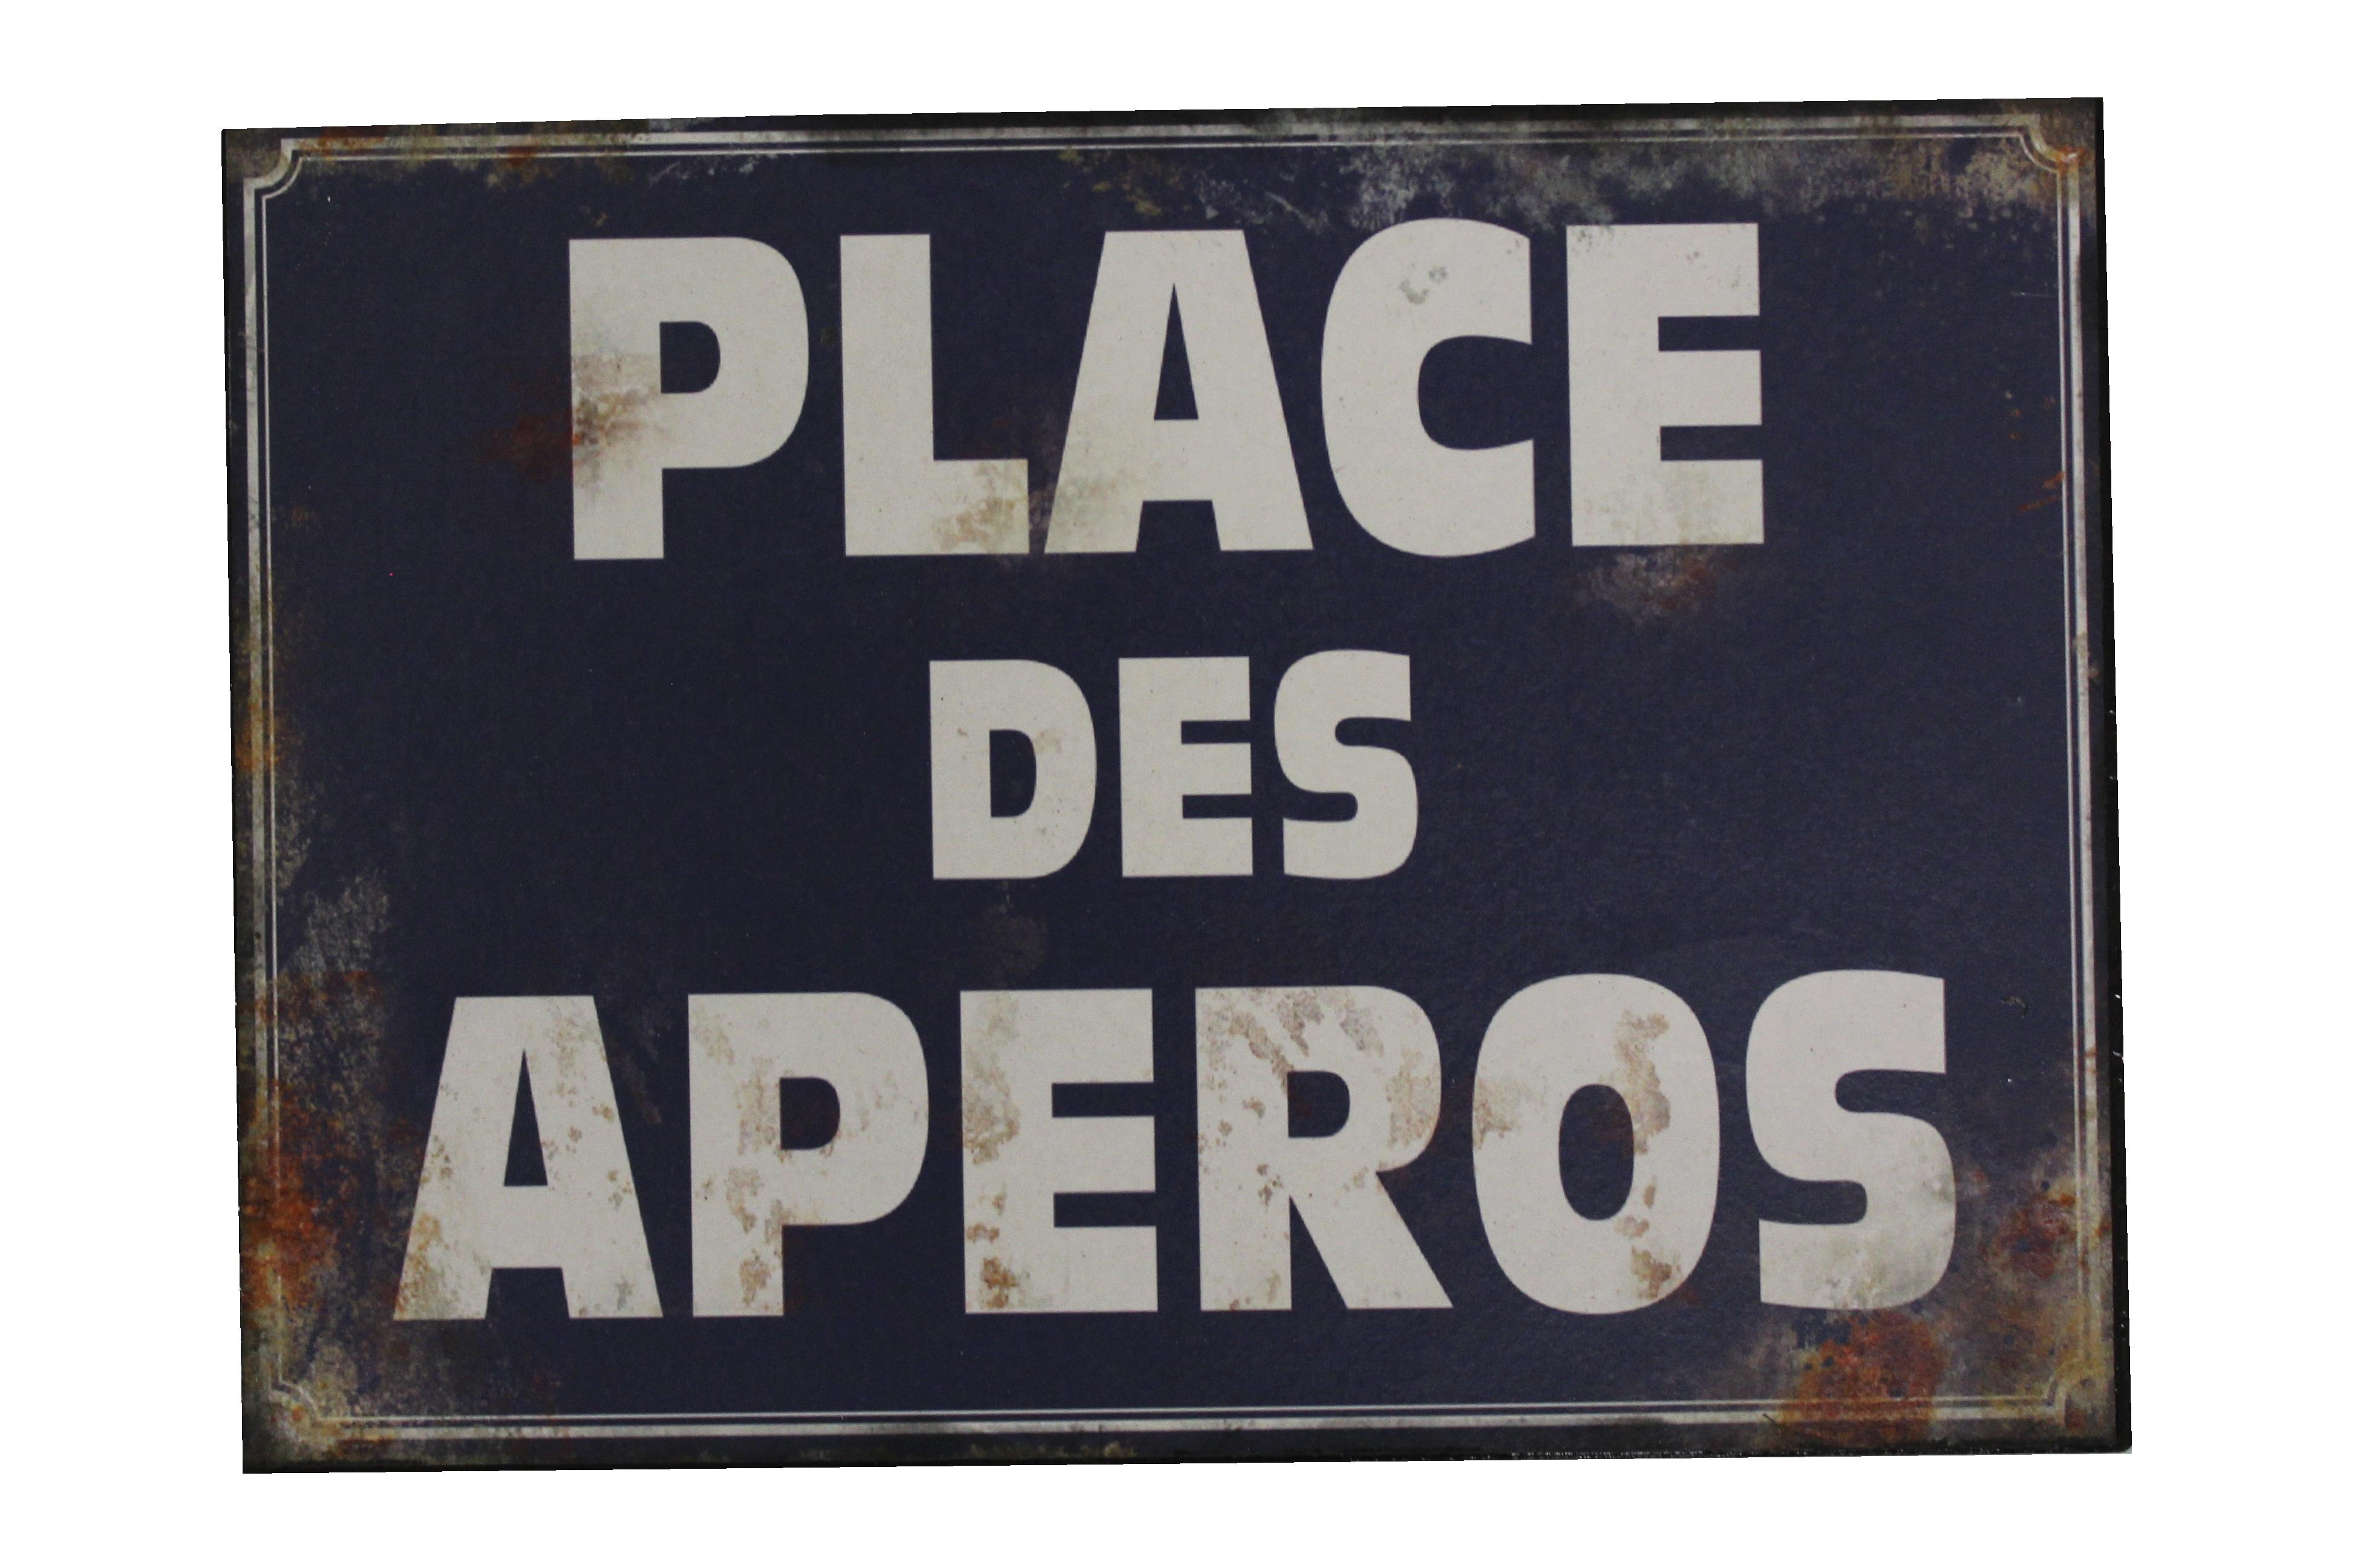 Табличка Place des Ap?rosДругое<br><br><br>Material: Металл<br>Length см: None<br>Width см: 23.1<br>Depth см: 2<br>Height см: 16.5